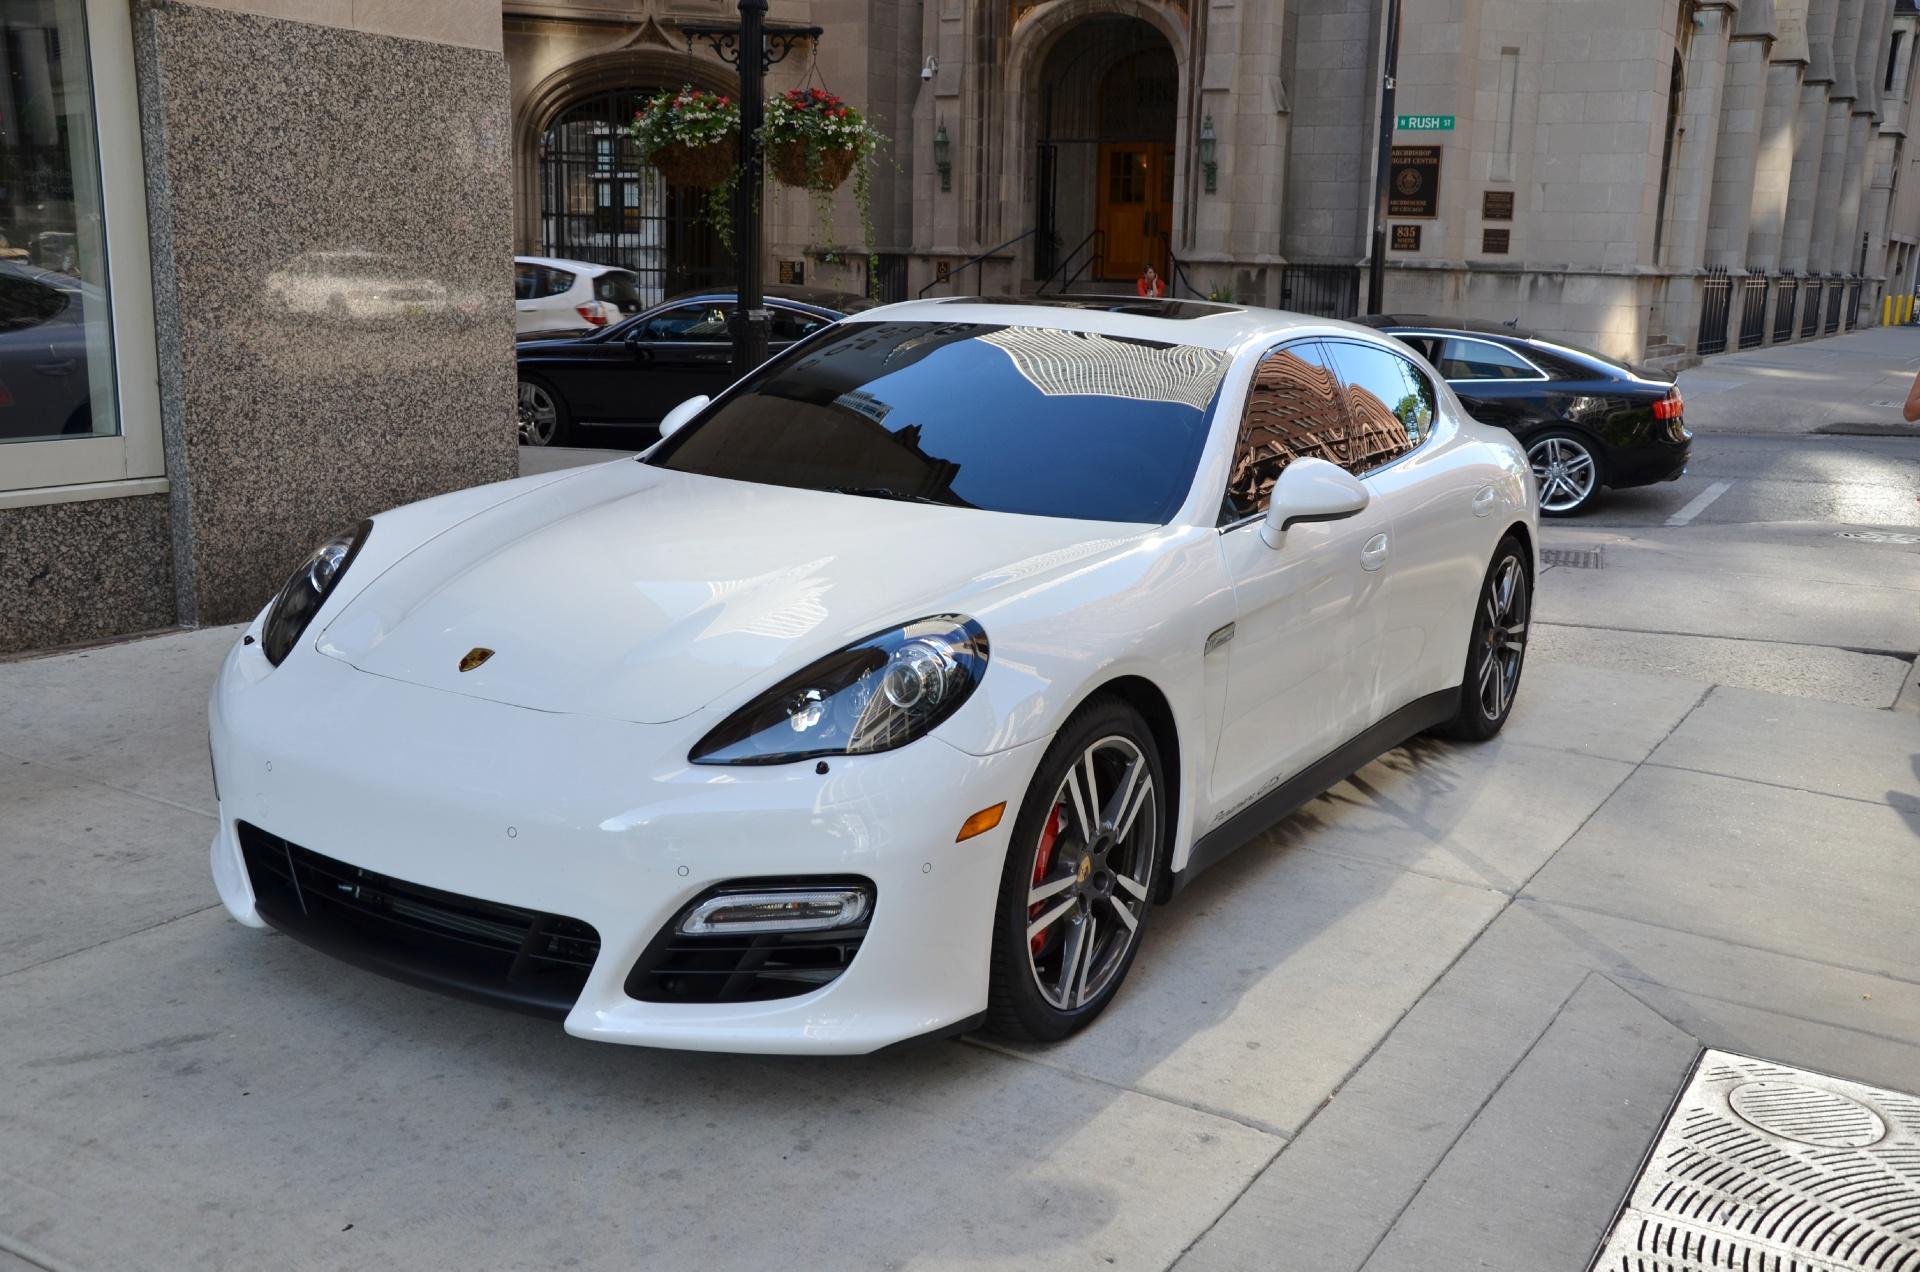 2013 Porsche Panamera - Information and photos - ZombieDrive on a white lincoln navigator, a white bmw m3 convertible, a white dodge journey, a white chevrolet camaro, a white jeep patriot, a white toyota avalon, a white acura tl, a white hyundai genesis, a white volkswagen beetle,